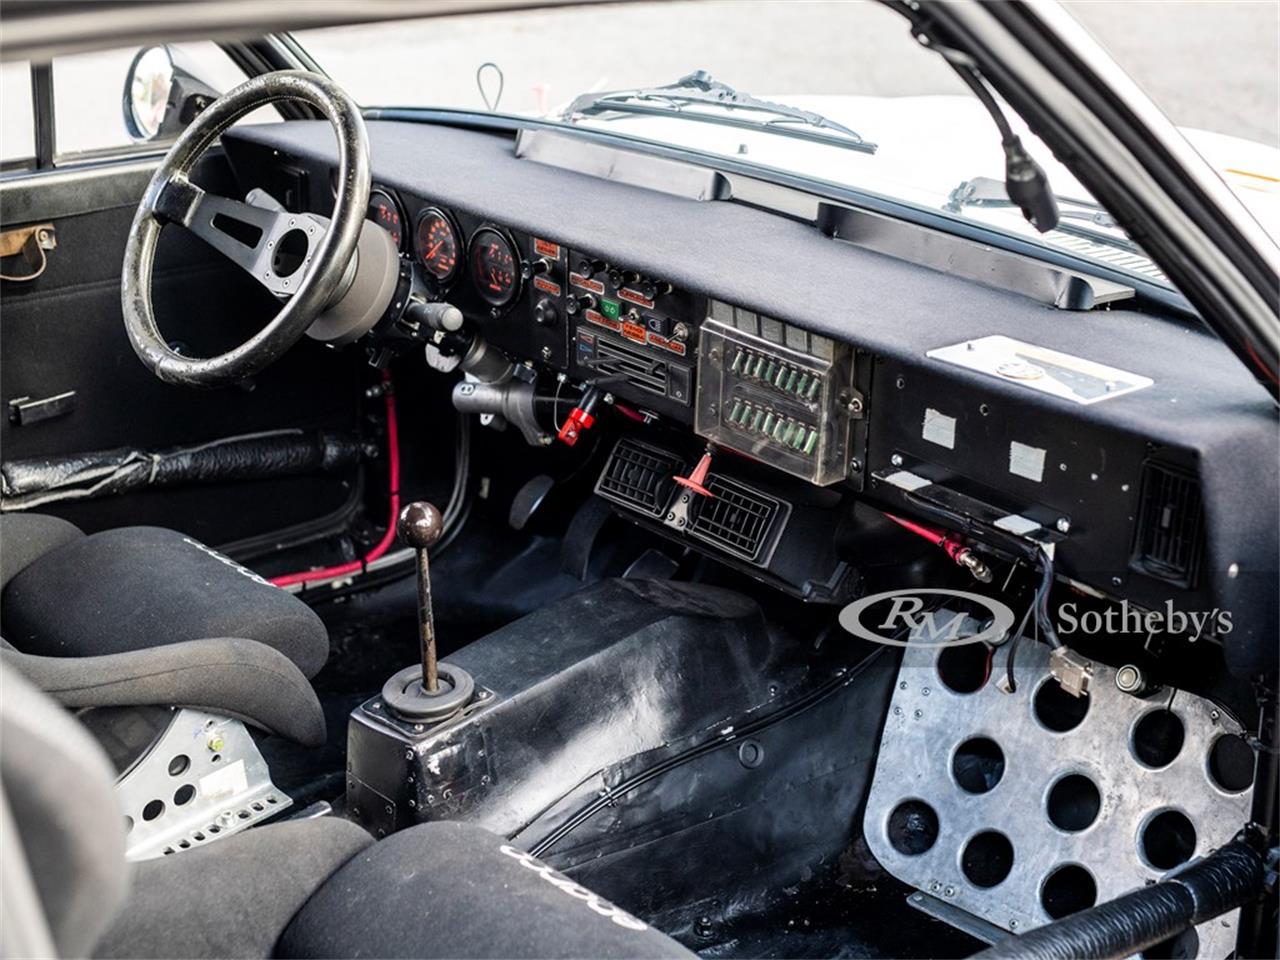 1980 Fiat Abarth (CC-1415643) for sale in London, United Kingdom